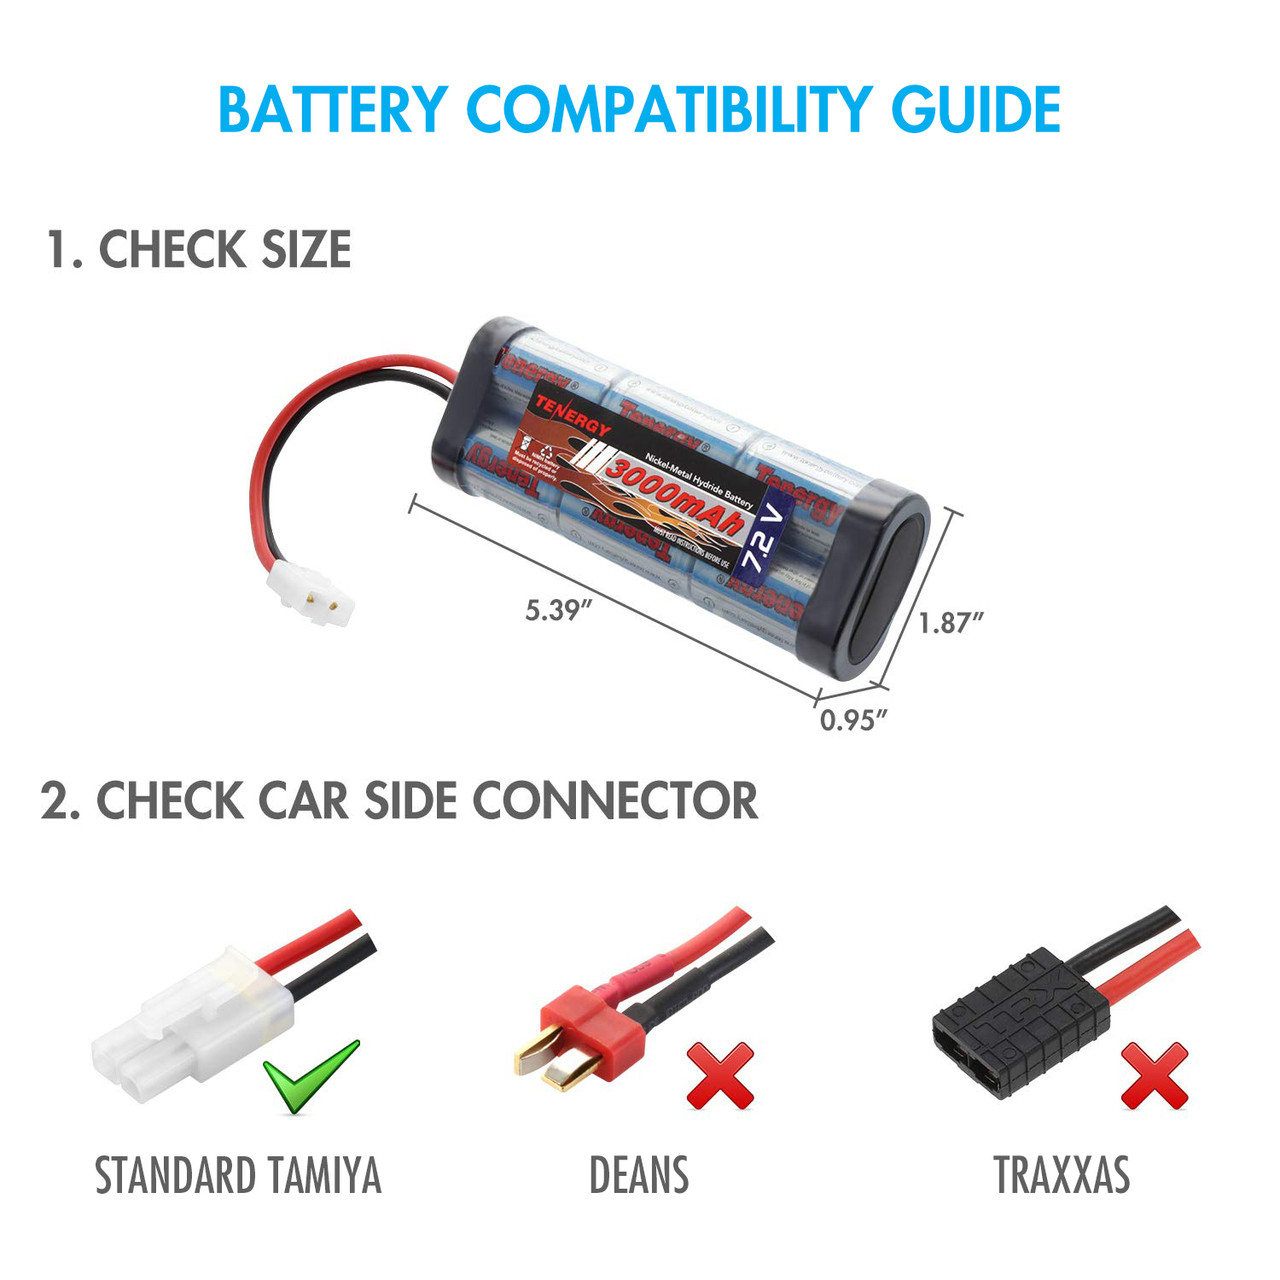 Combo: Tenergy NiMH 7.2V 3800mAh Battery Pack, 2-pack + Charger (#01025)